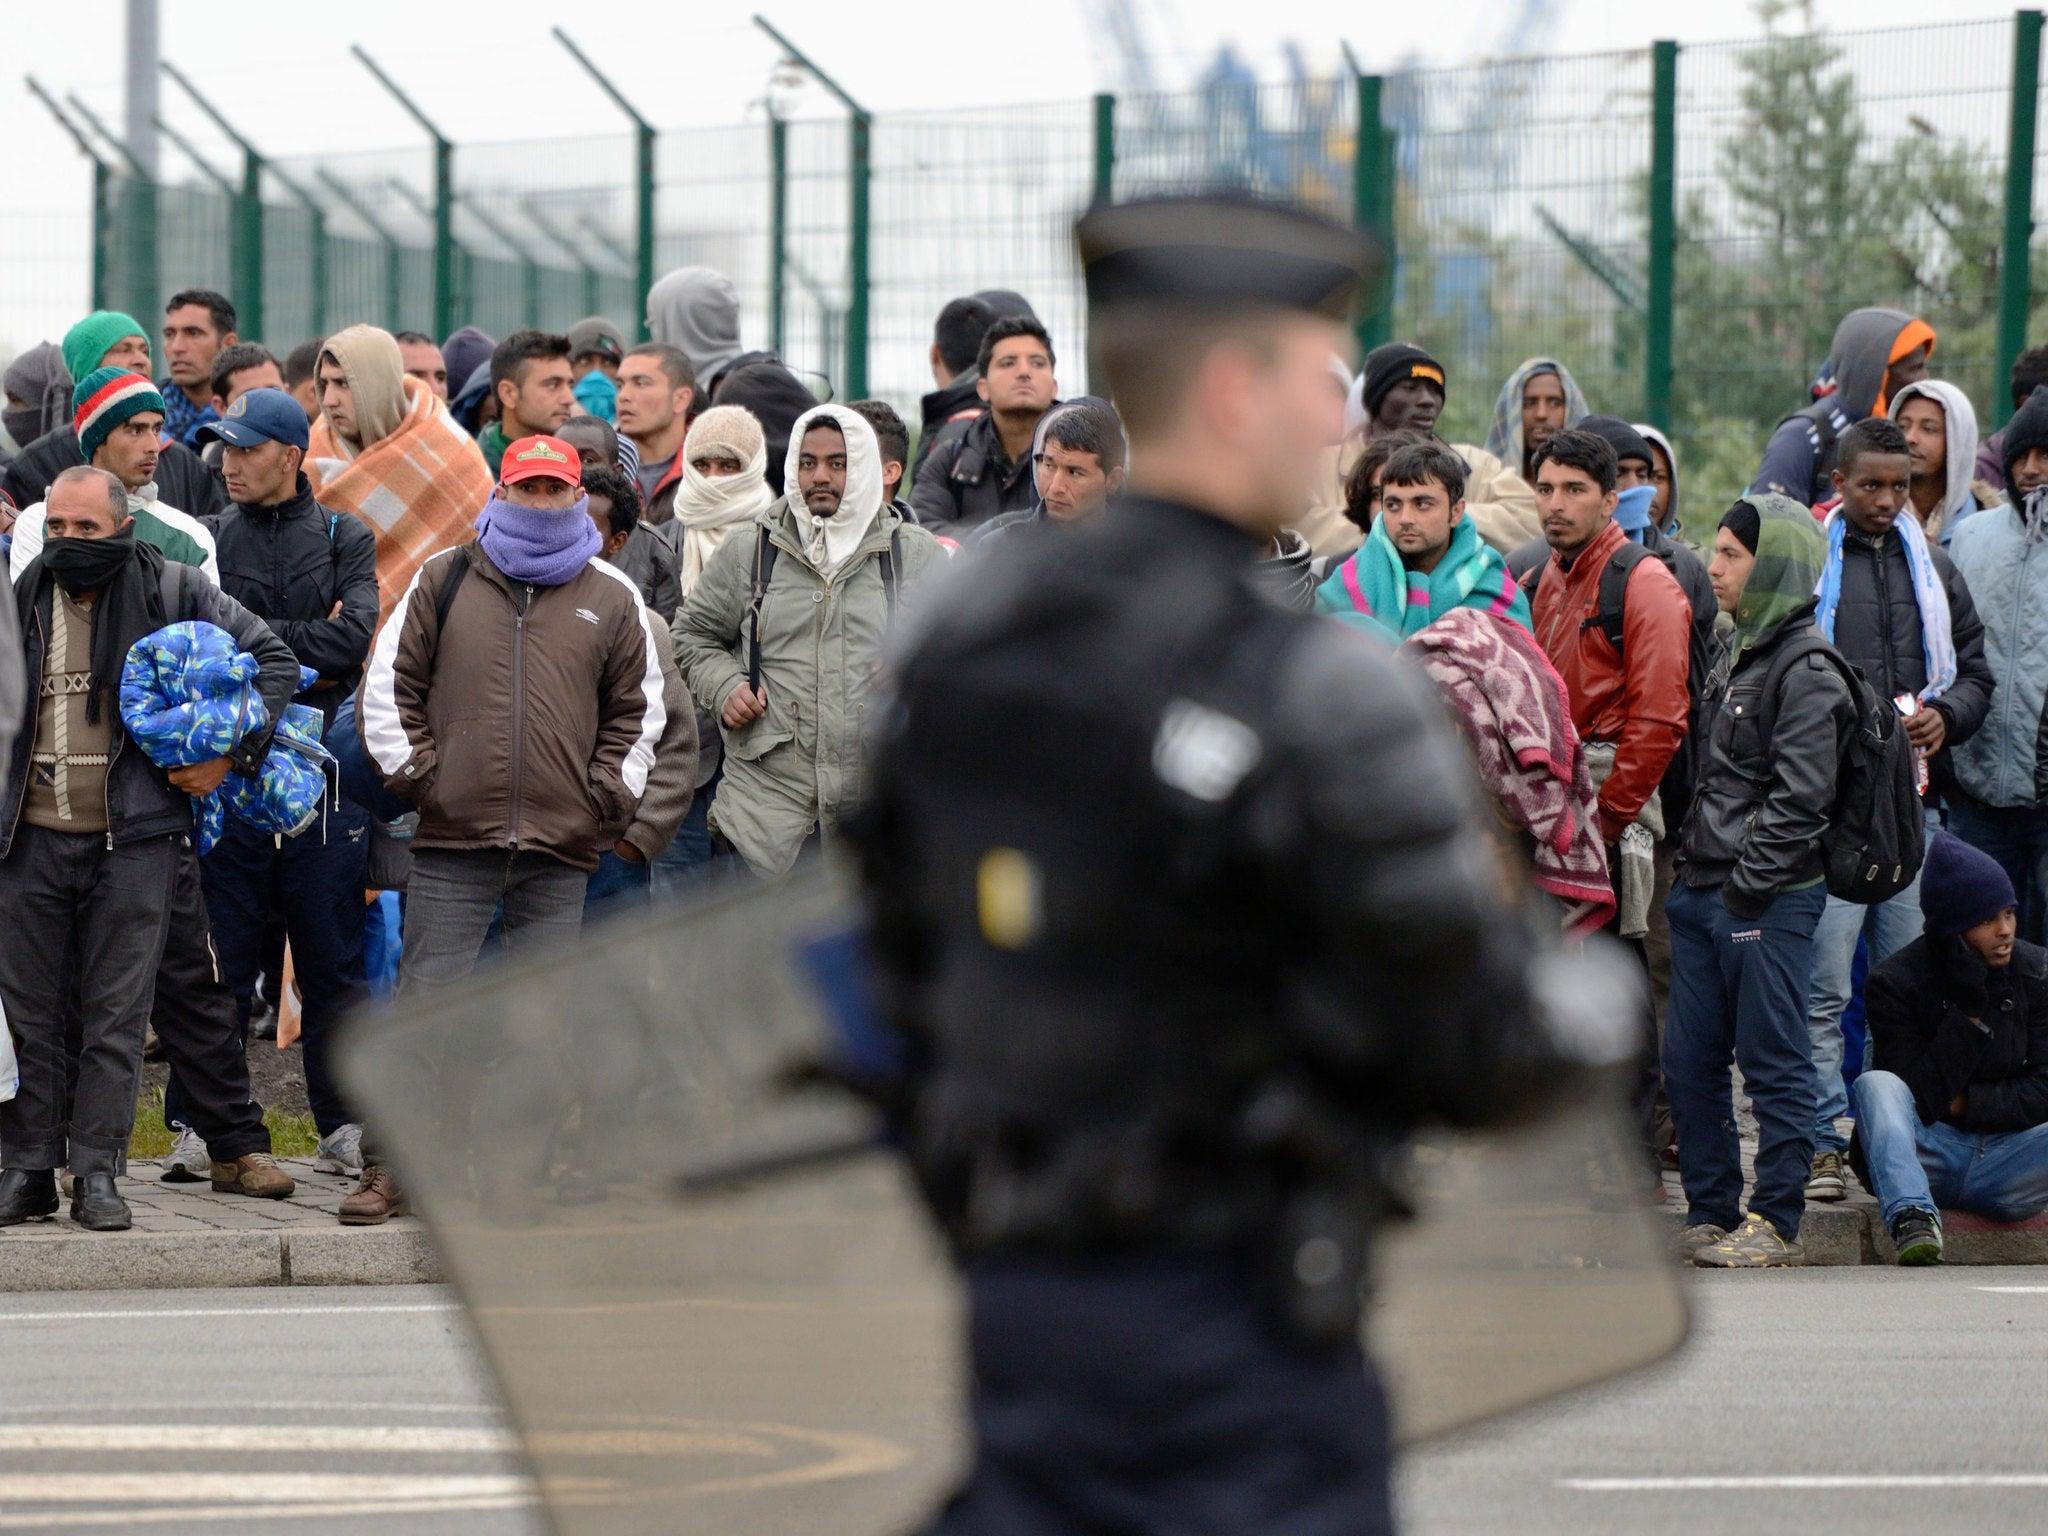 Several injured in brawl at Calais 'jungle' migrant camp | The